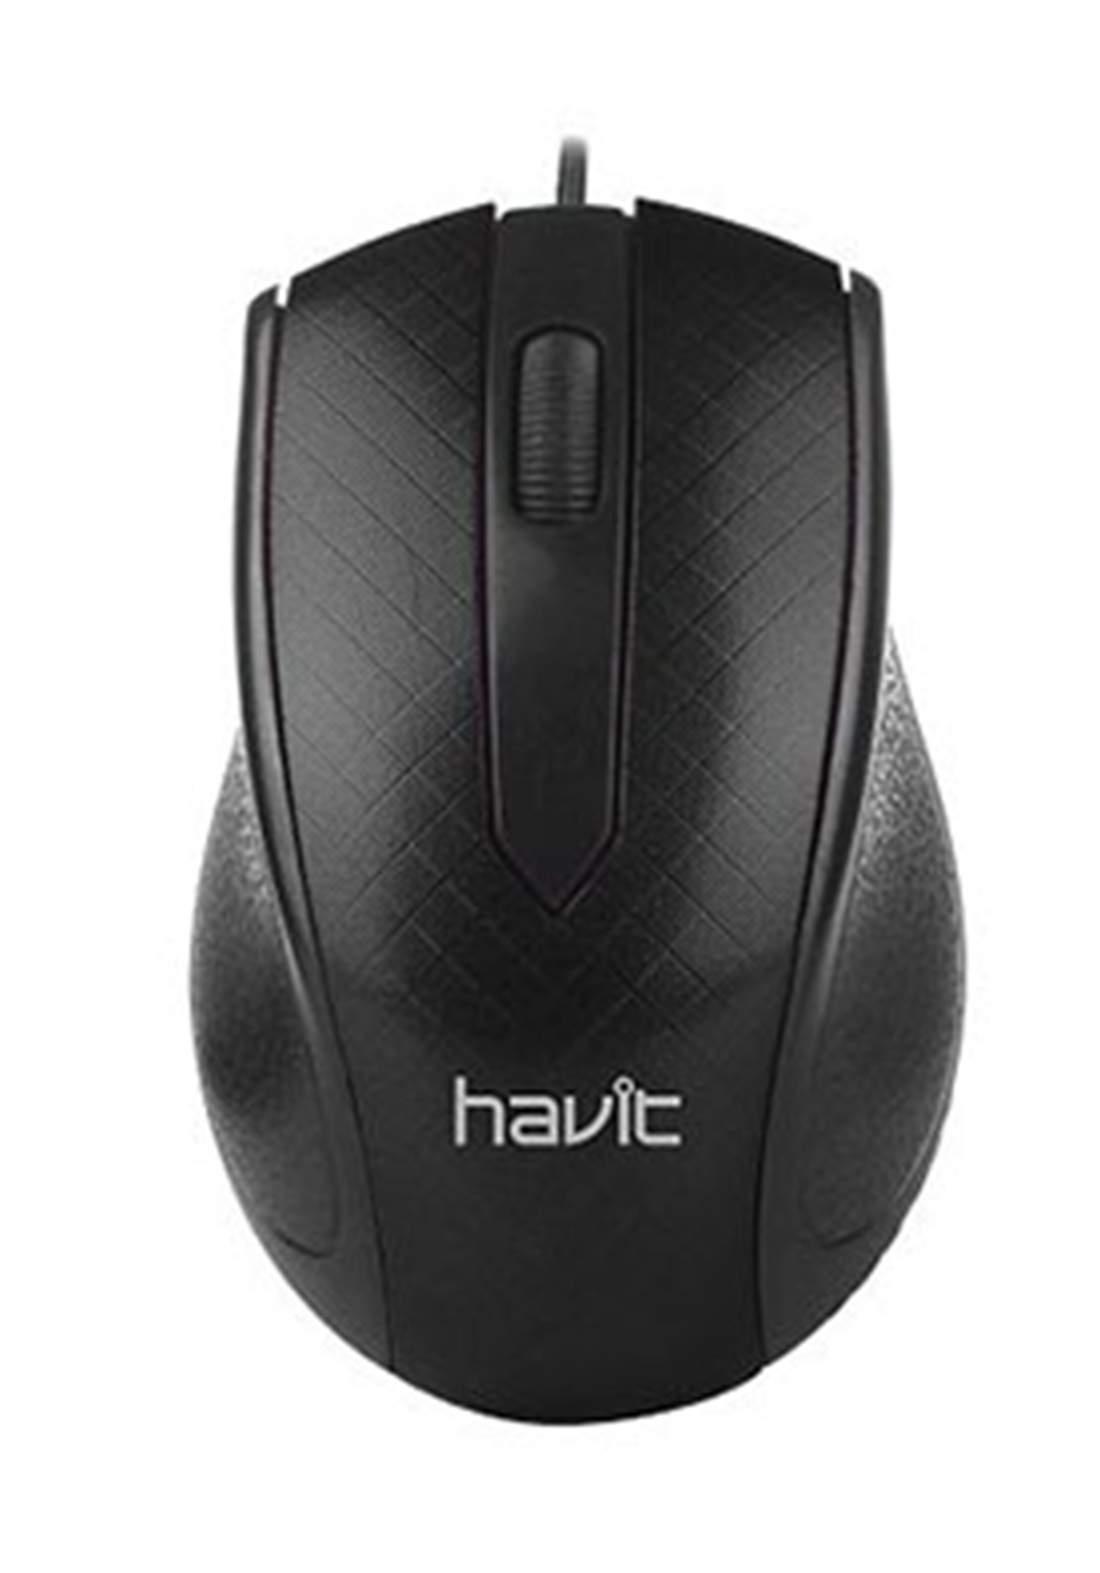 Havit Hv-Ms80 Usb Optical Mouse ماوس